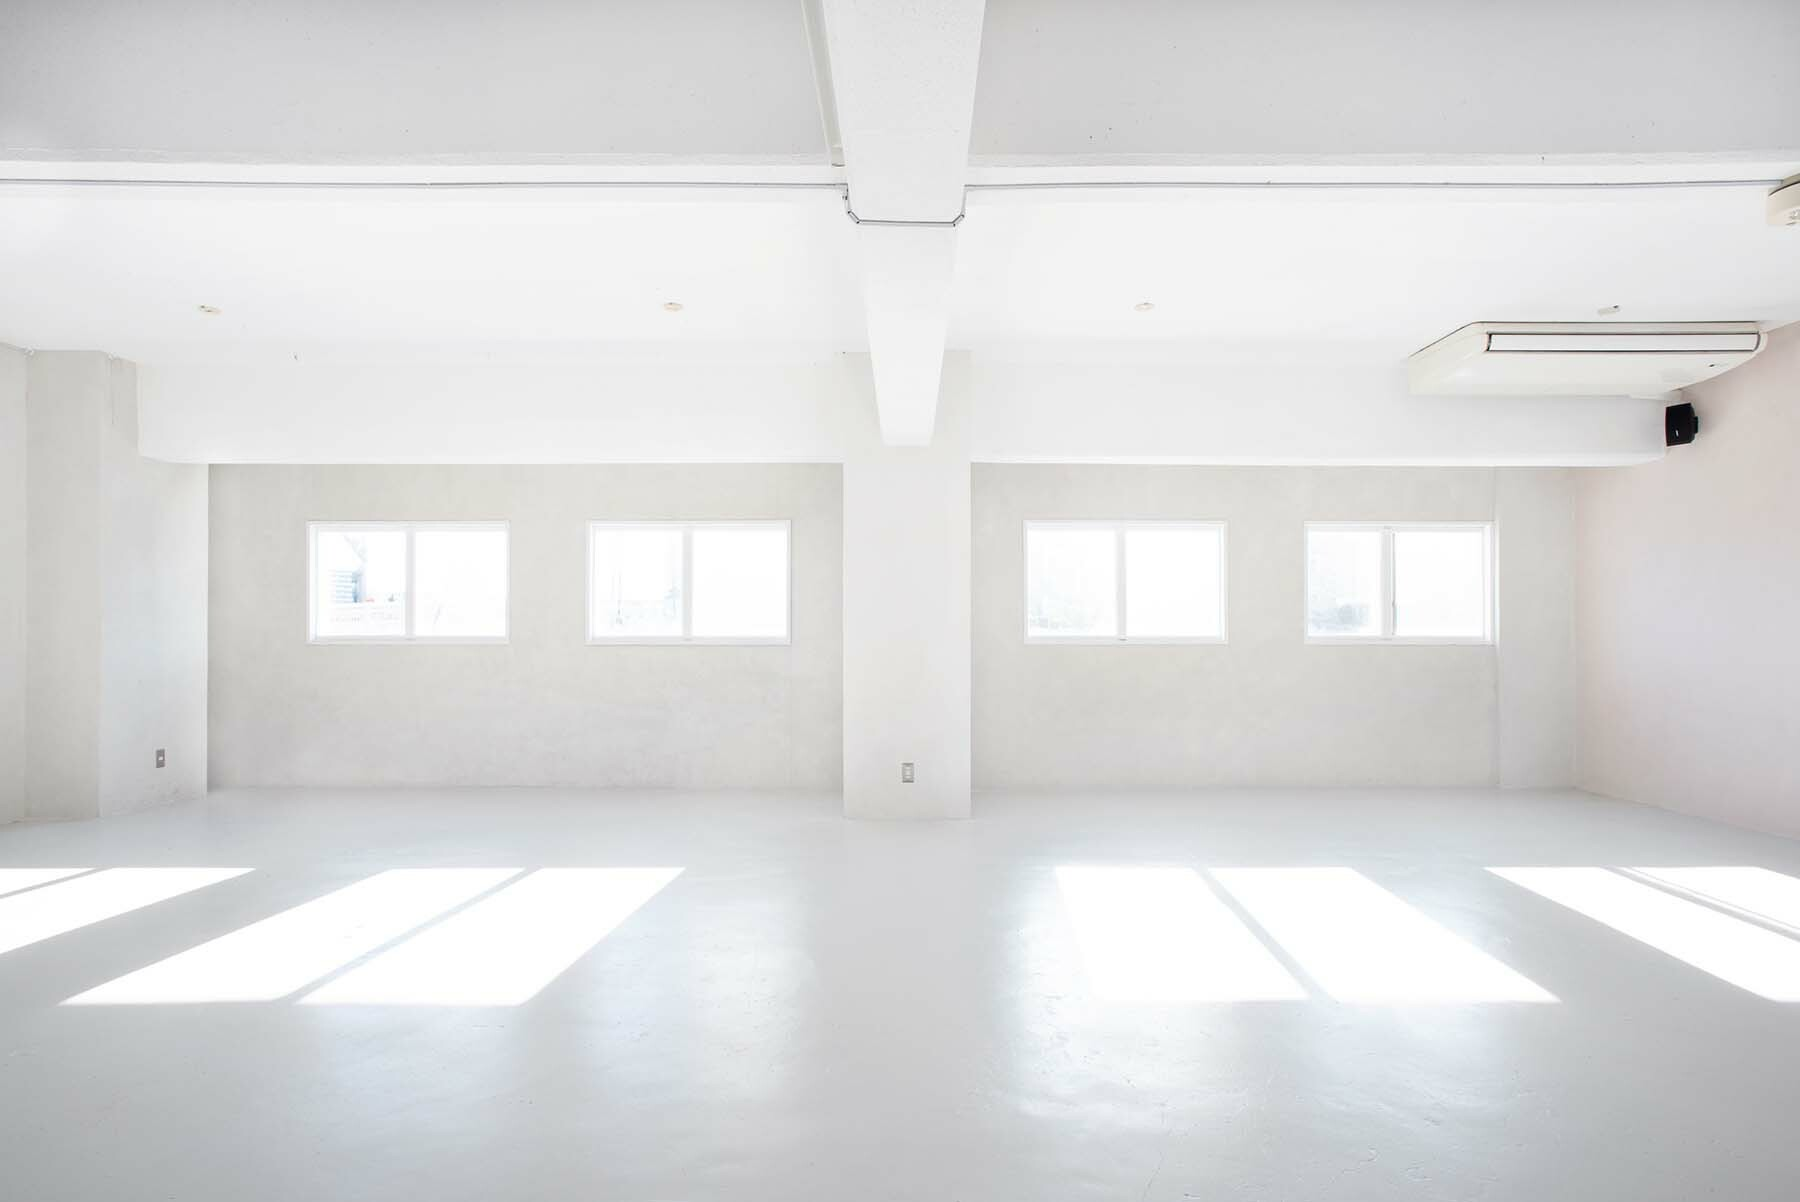 StudioBRICK 2F (スタジオブリック八丁堀2F)本棚